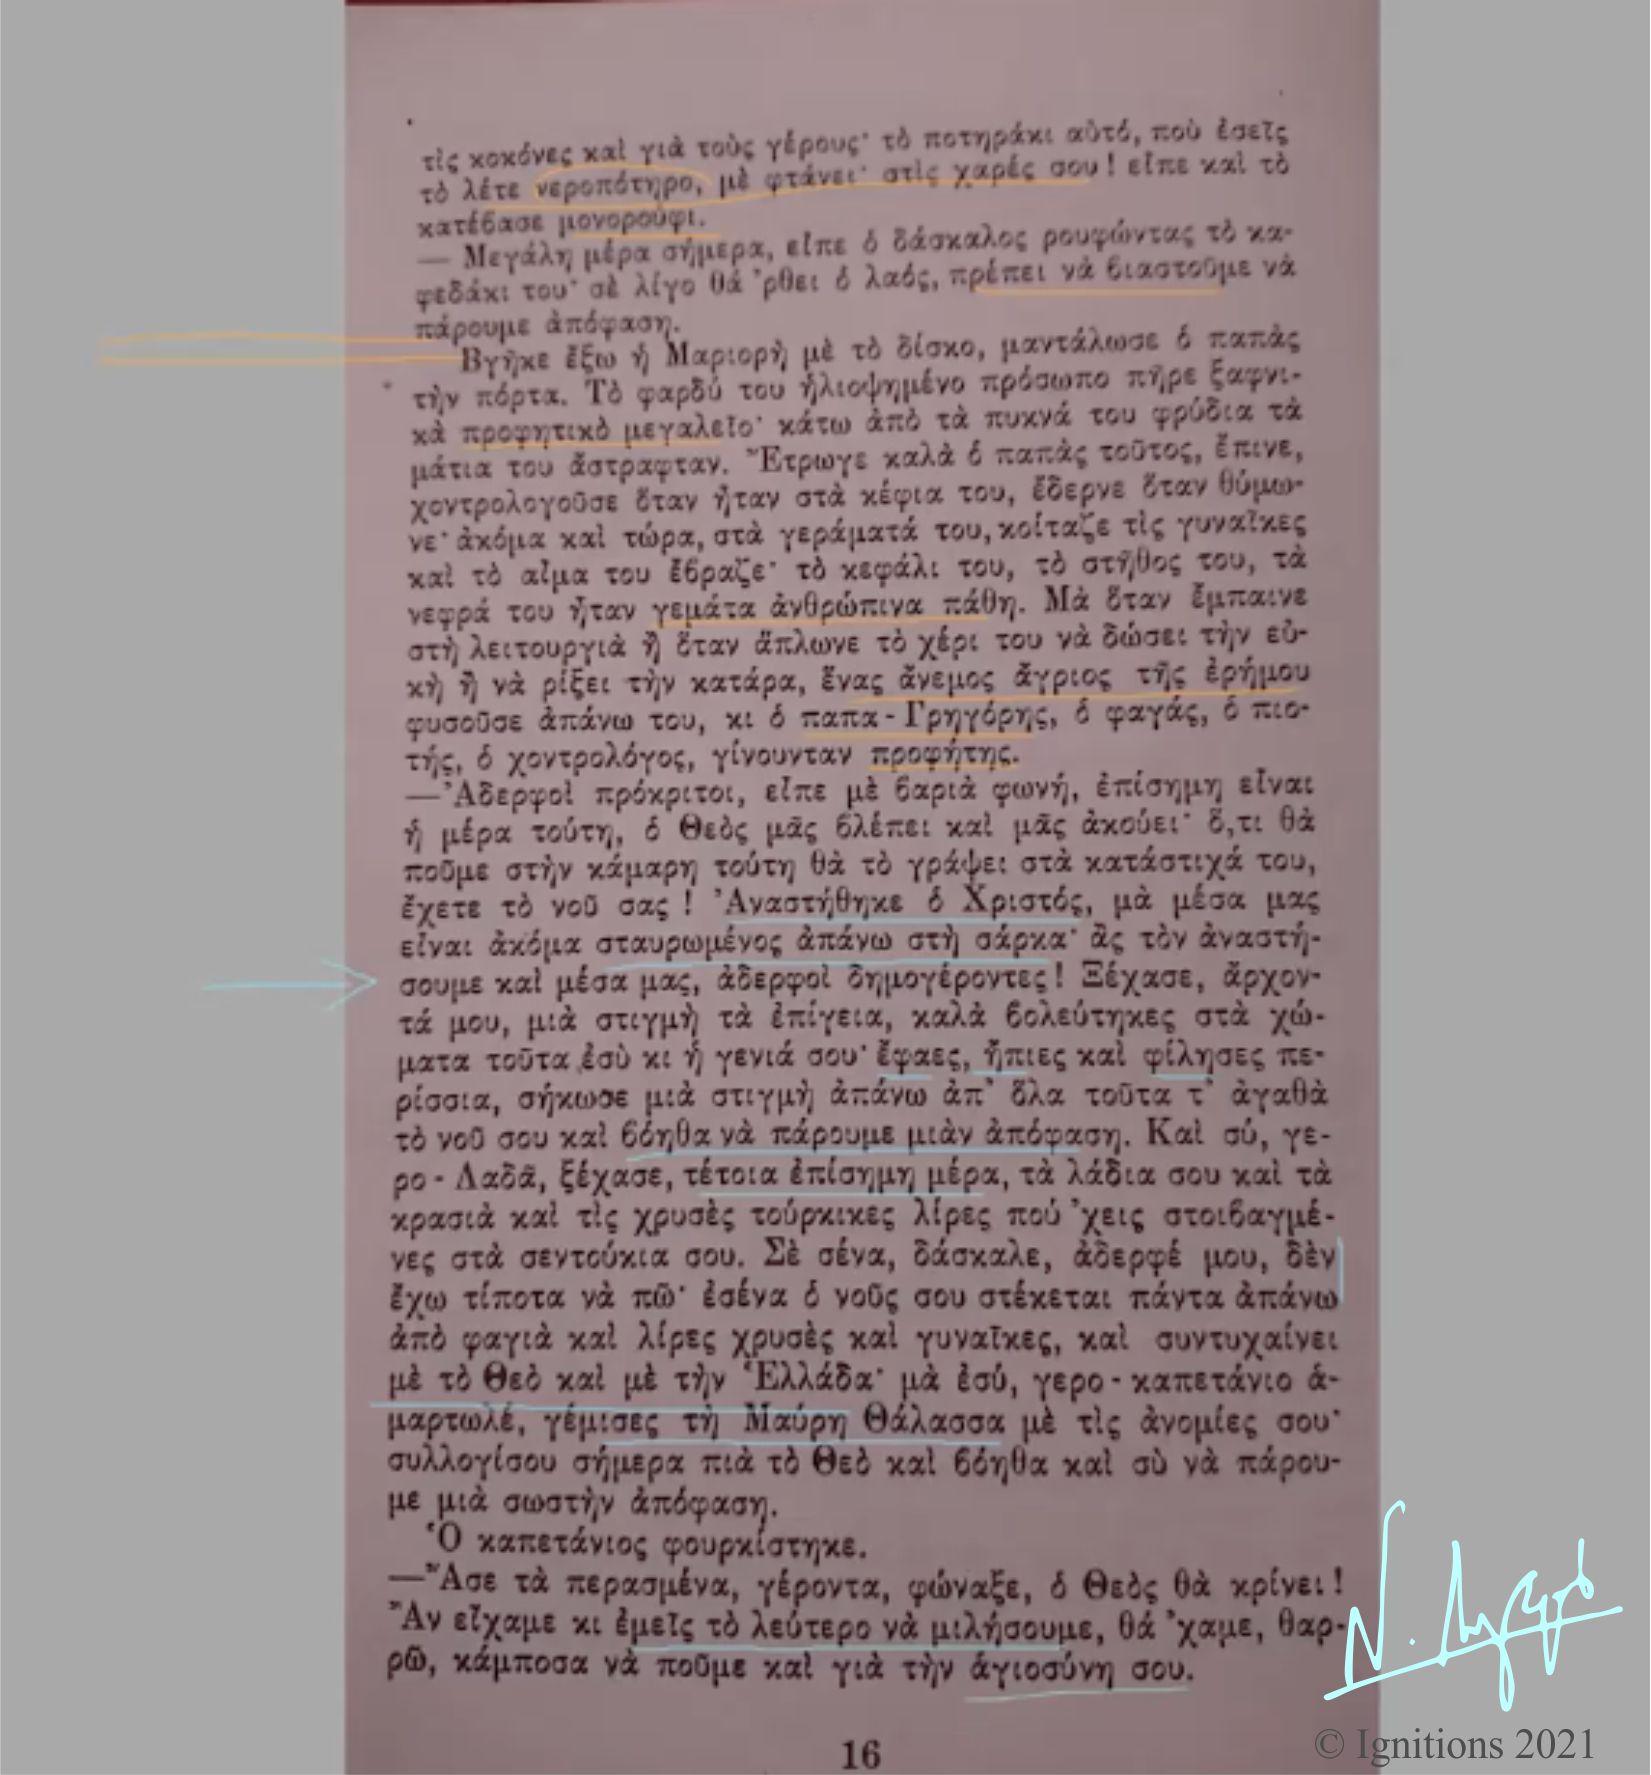 60111 - XI - Η συνέχεια της Σταύρωσης του Χριστού. Συνέχεια IX. (Dessin)